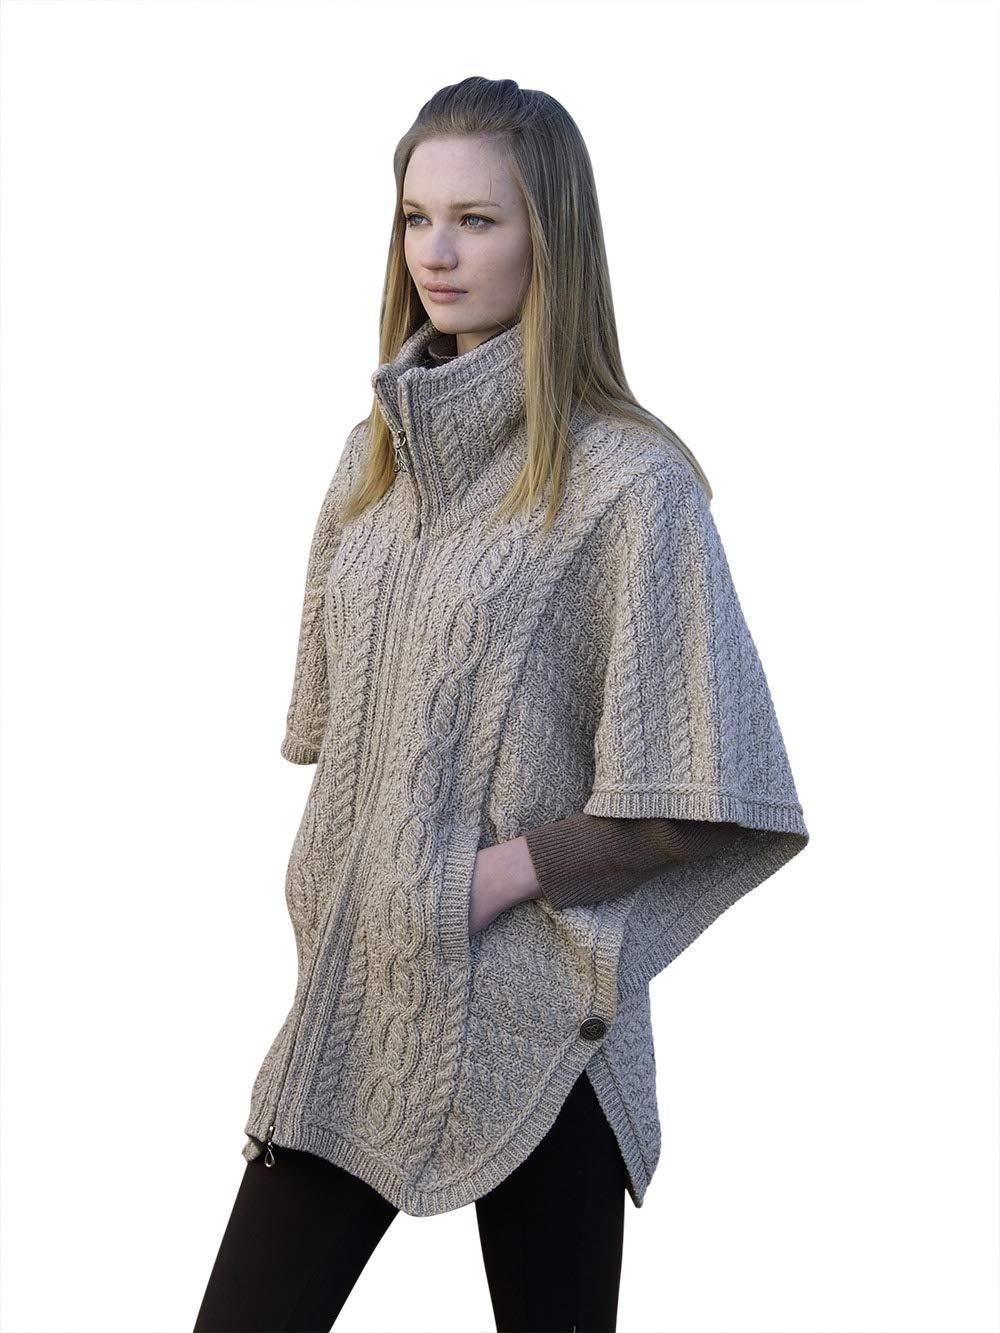 100% Irish Merino Wool Batwing Aran Knit Jacket, Parsnip, Medium-Large,Parsnip,Medium-Large